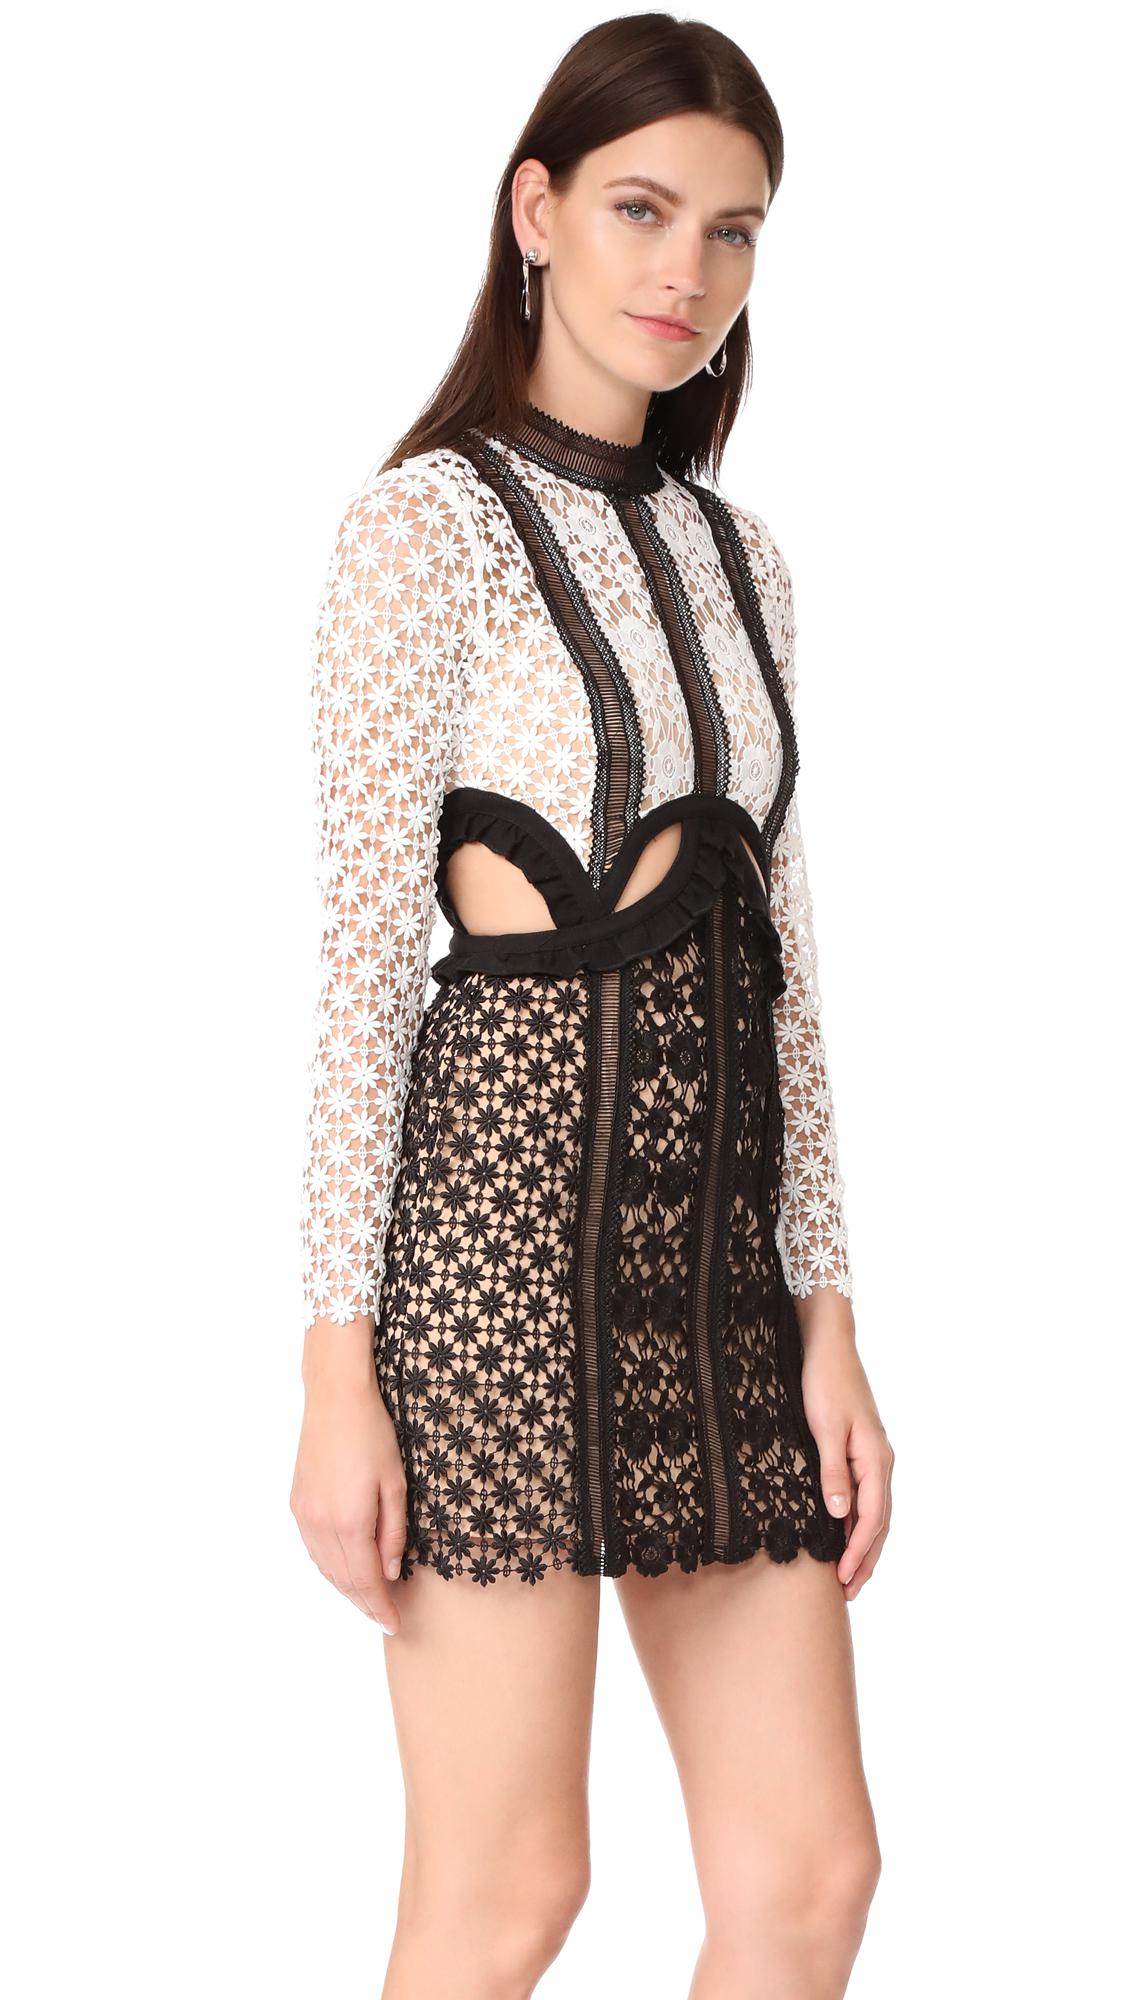 e7cd05ee050823 Lyst - Self-Portrait Payne Cutout Mini Dress in Black